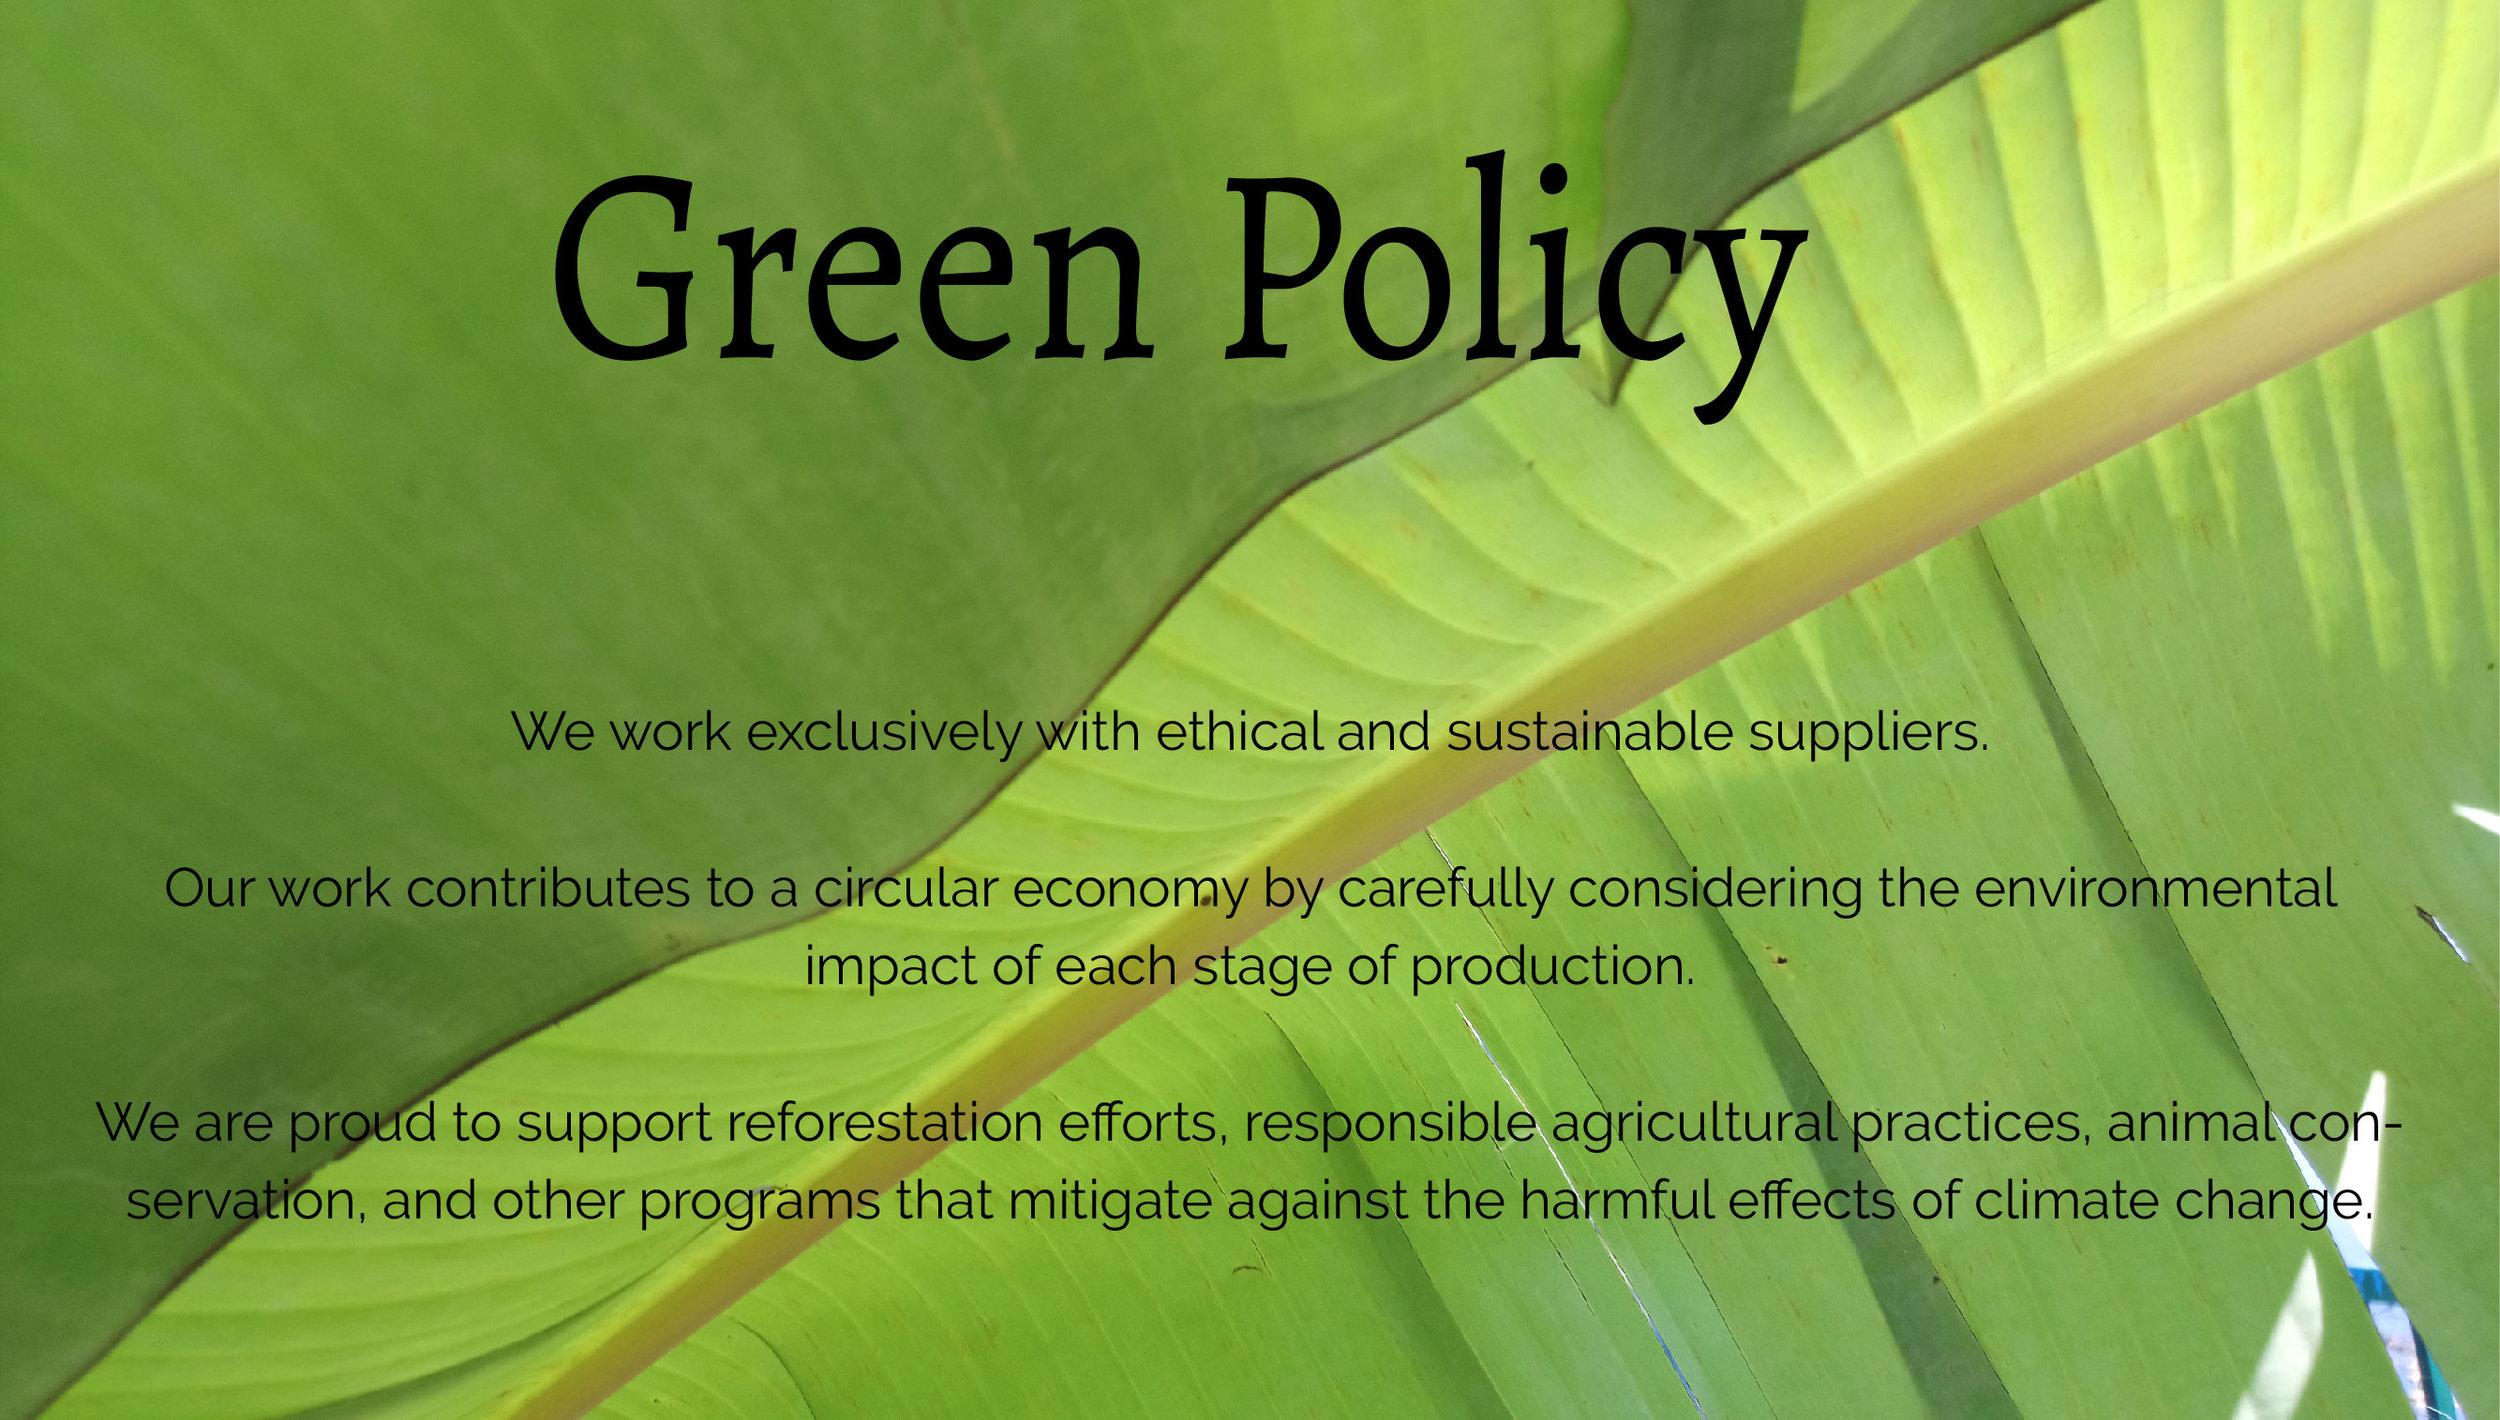 Green Policy.jpg